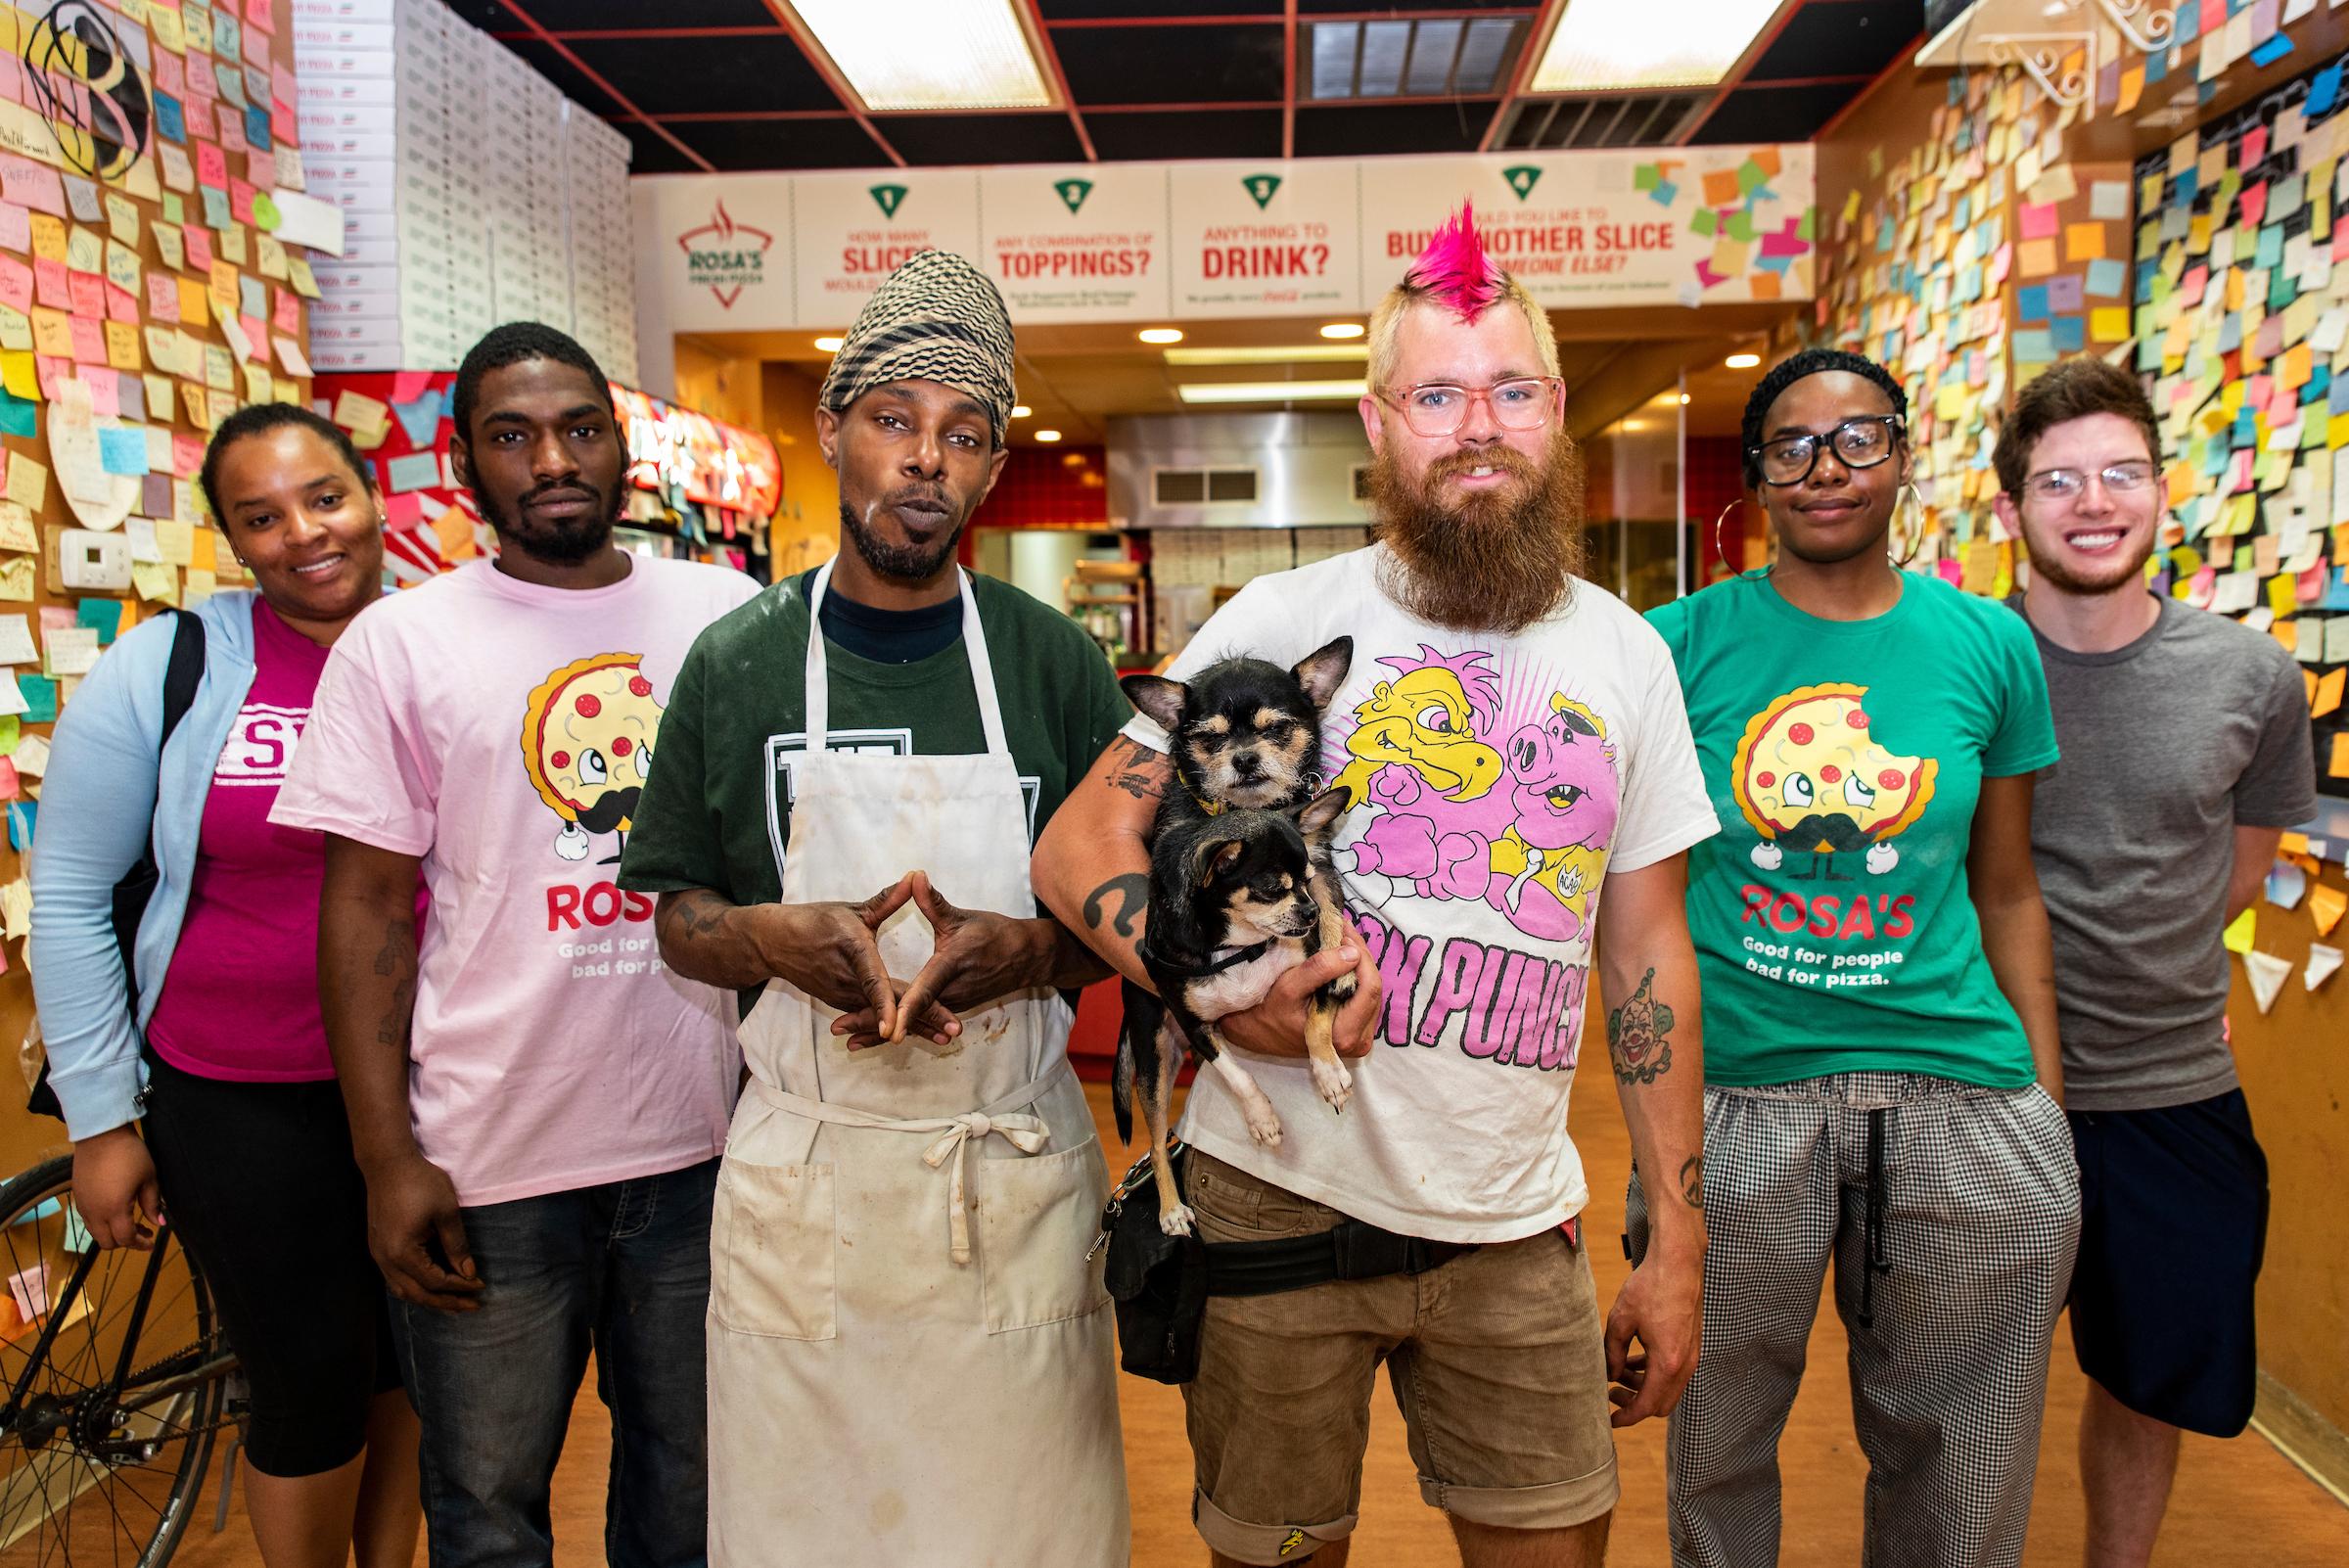 Joe Cox (center) with Brielle Harbin (far left), Max Robert (far right) and staff at Rosa's Fresh Pizza in center city.